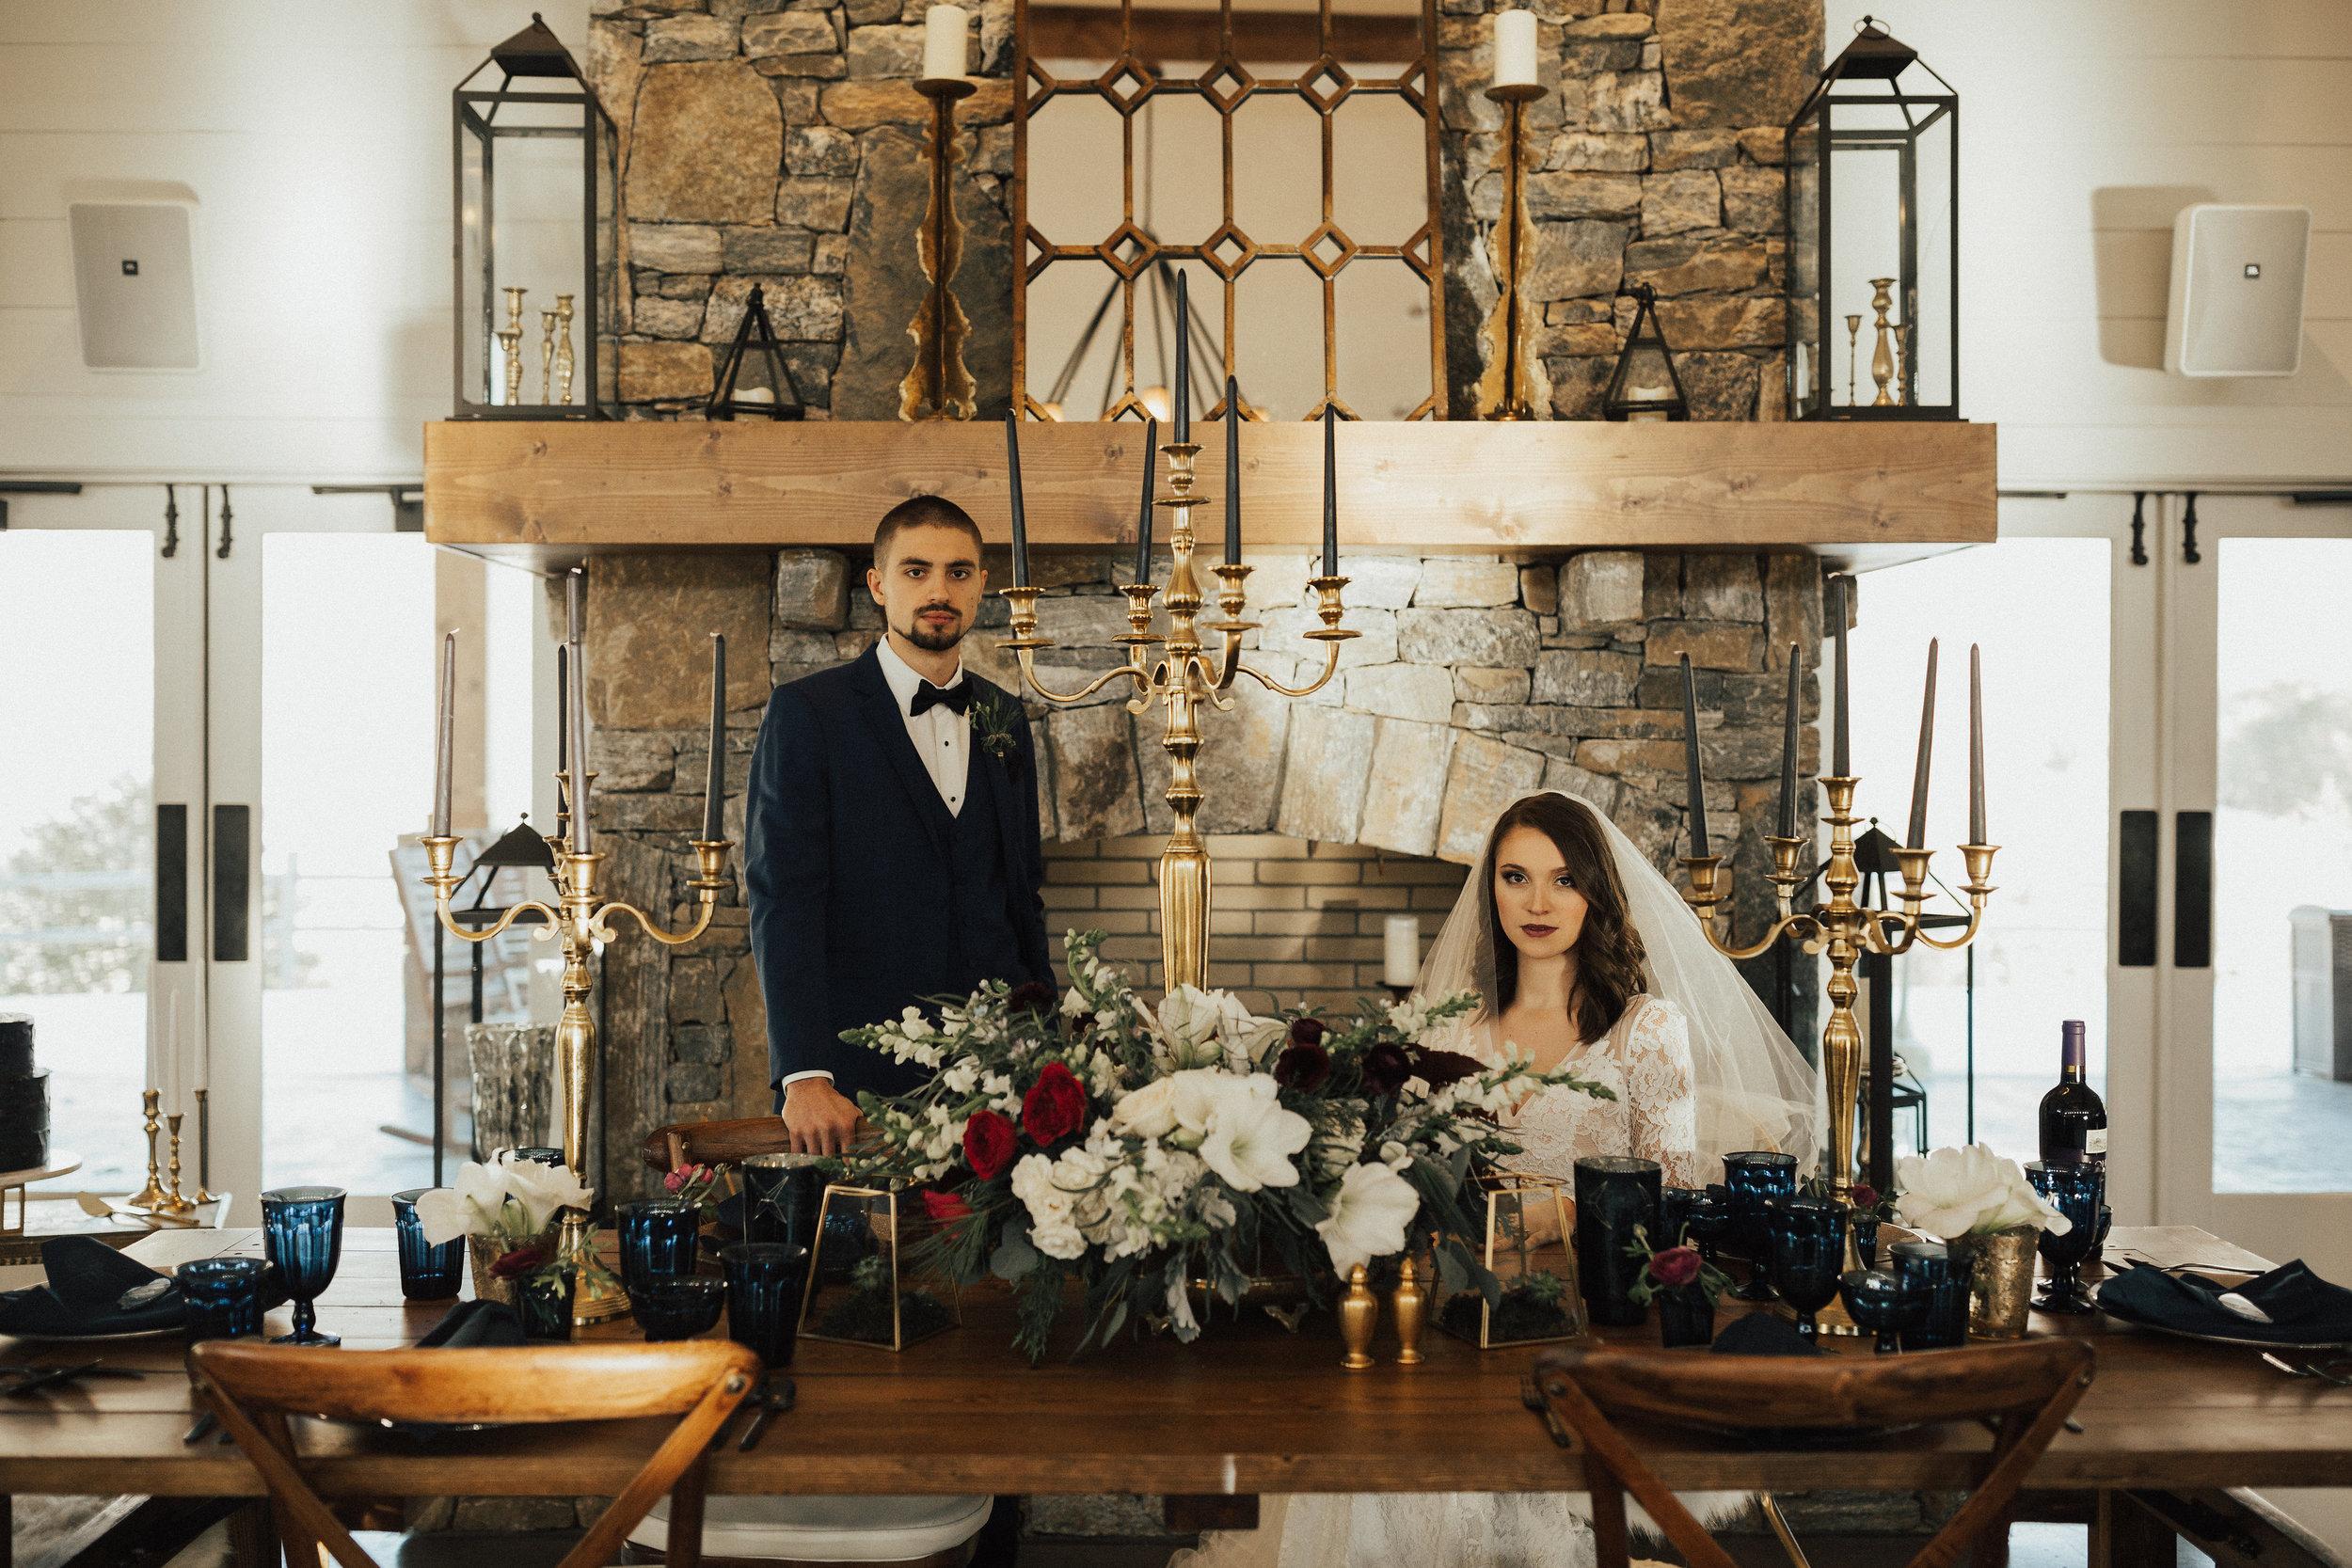 Joy-Unscripted-Wedding-Styled-Shoot-Celestial-Winter-28.jpg